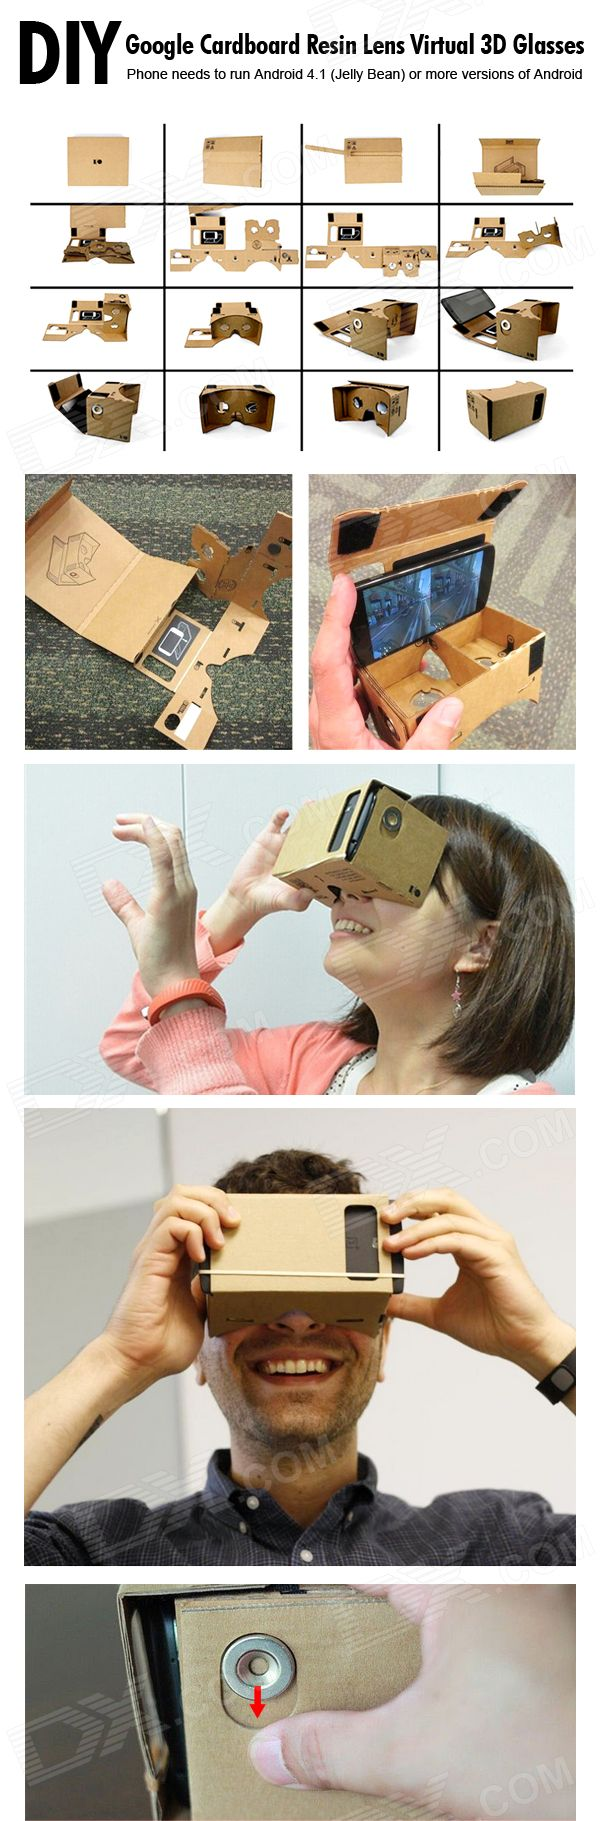 "NEJE ZB02 DIY Google Cardboard + Resin Lens Virtual 3D Glasses w/ NFC for 4~7"" Cellphones - Brown - Free Shipping - DealExtreme"